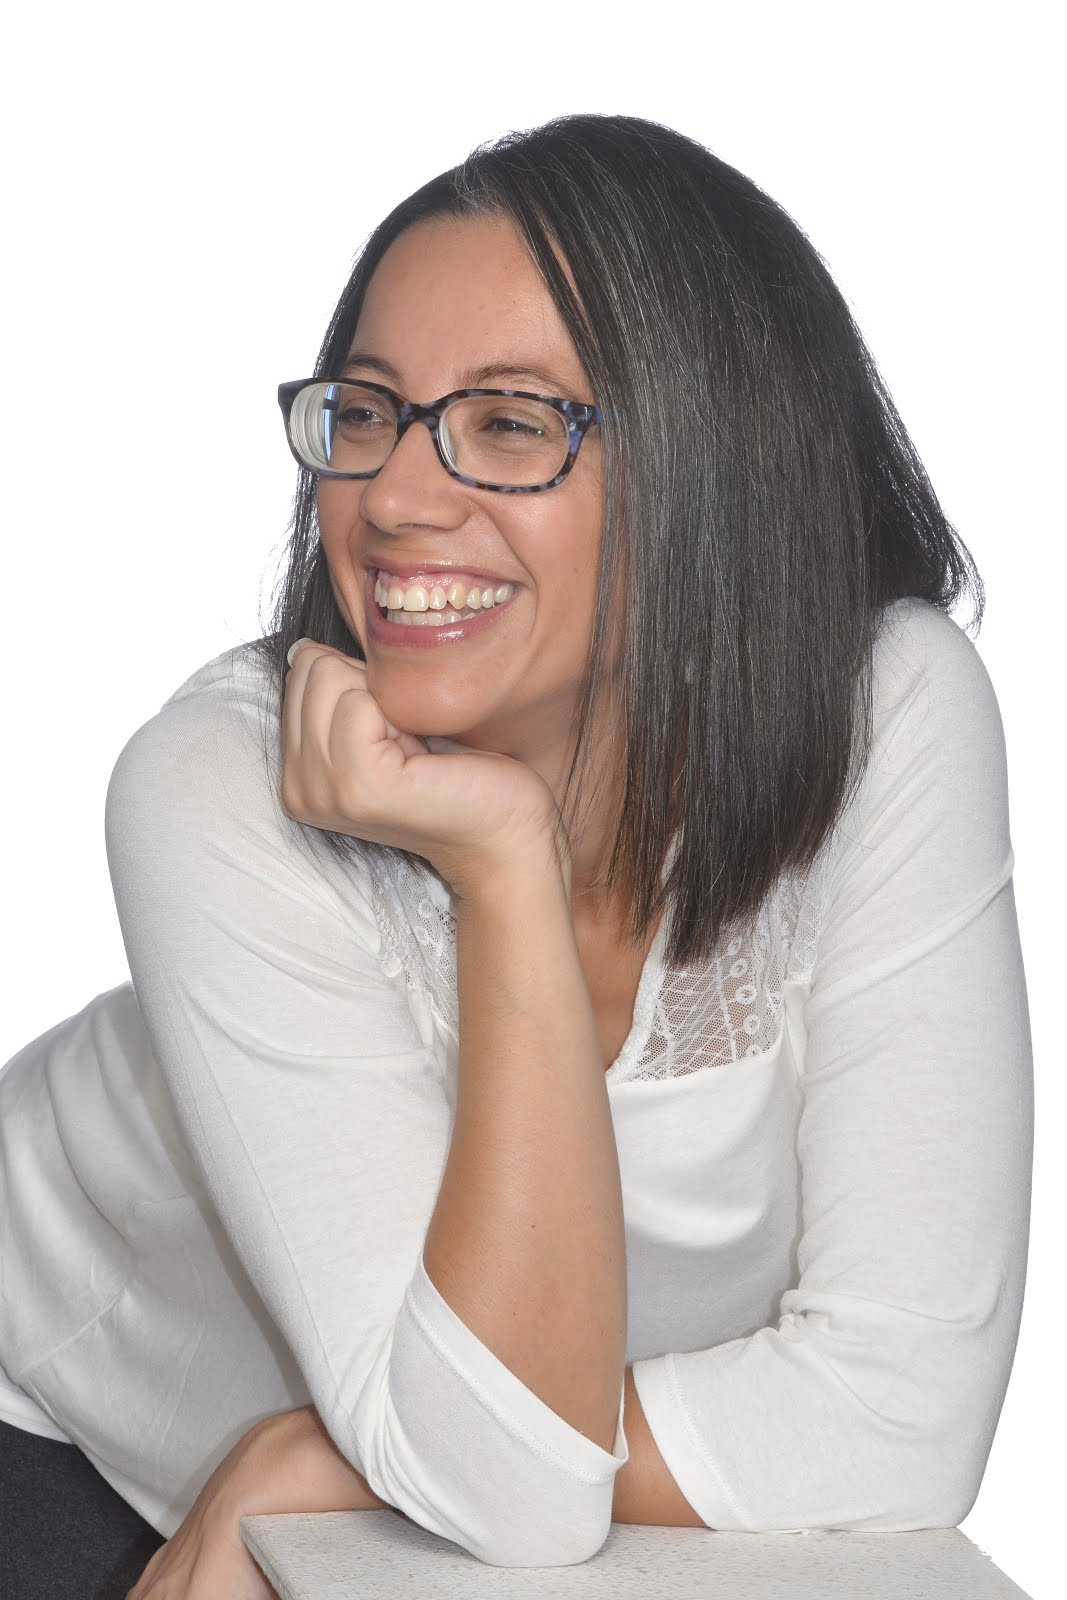 Lucía Esther Quintero González